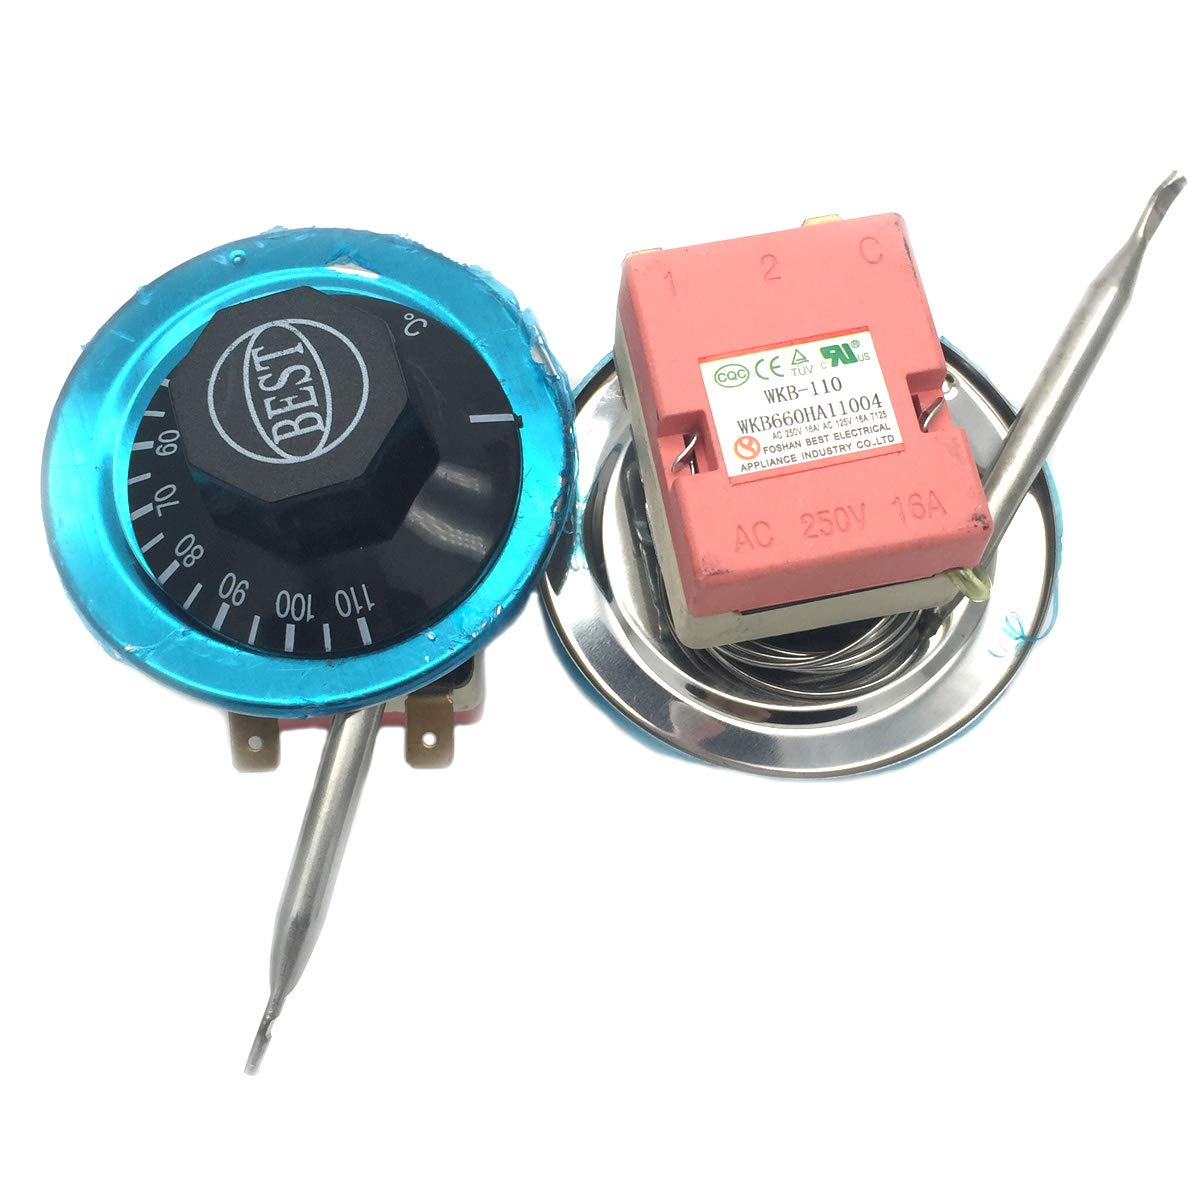 COMOK 30-110 Degree Adjustable Temperature Controller AC 250V 16A Capillary Thermostat Oven Temperature Controller 2PCS